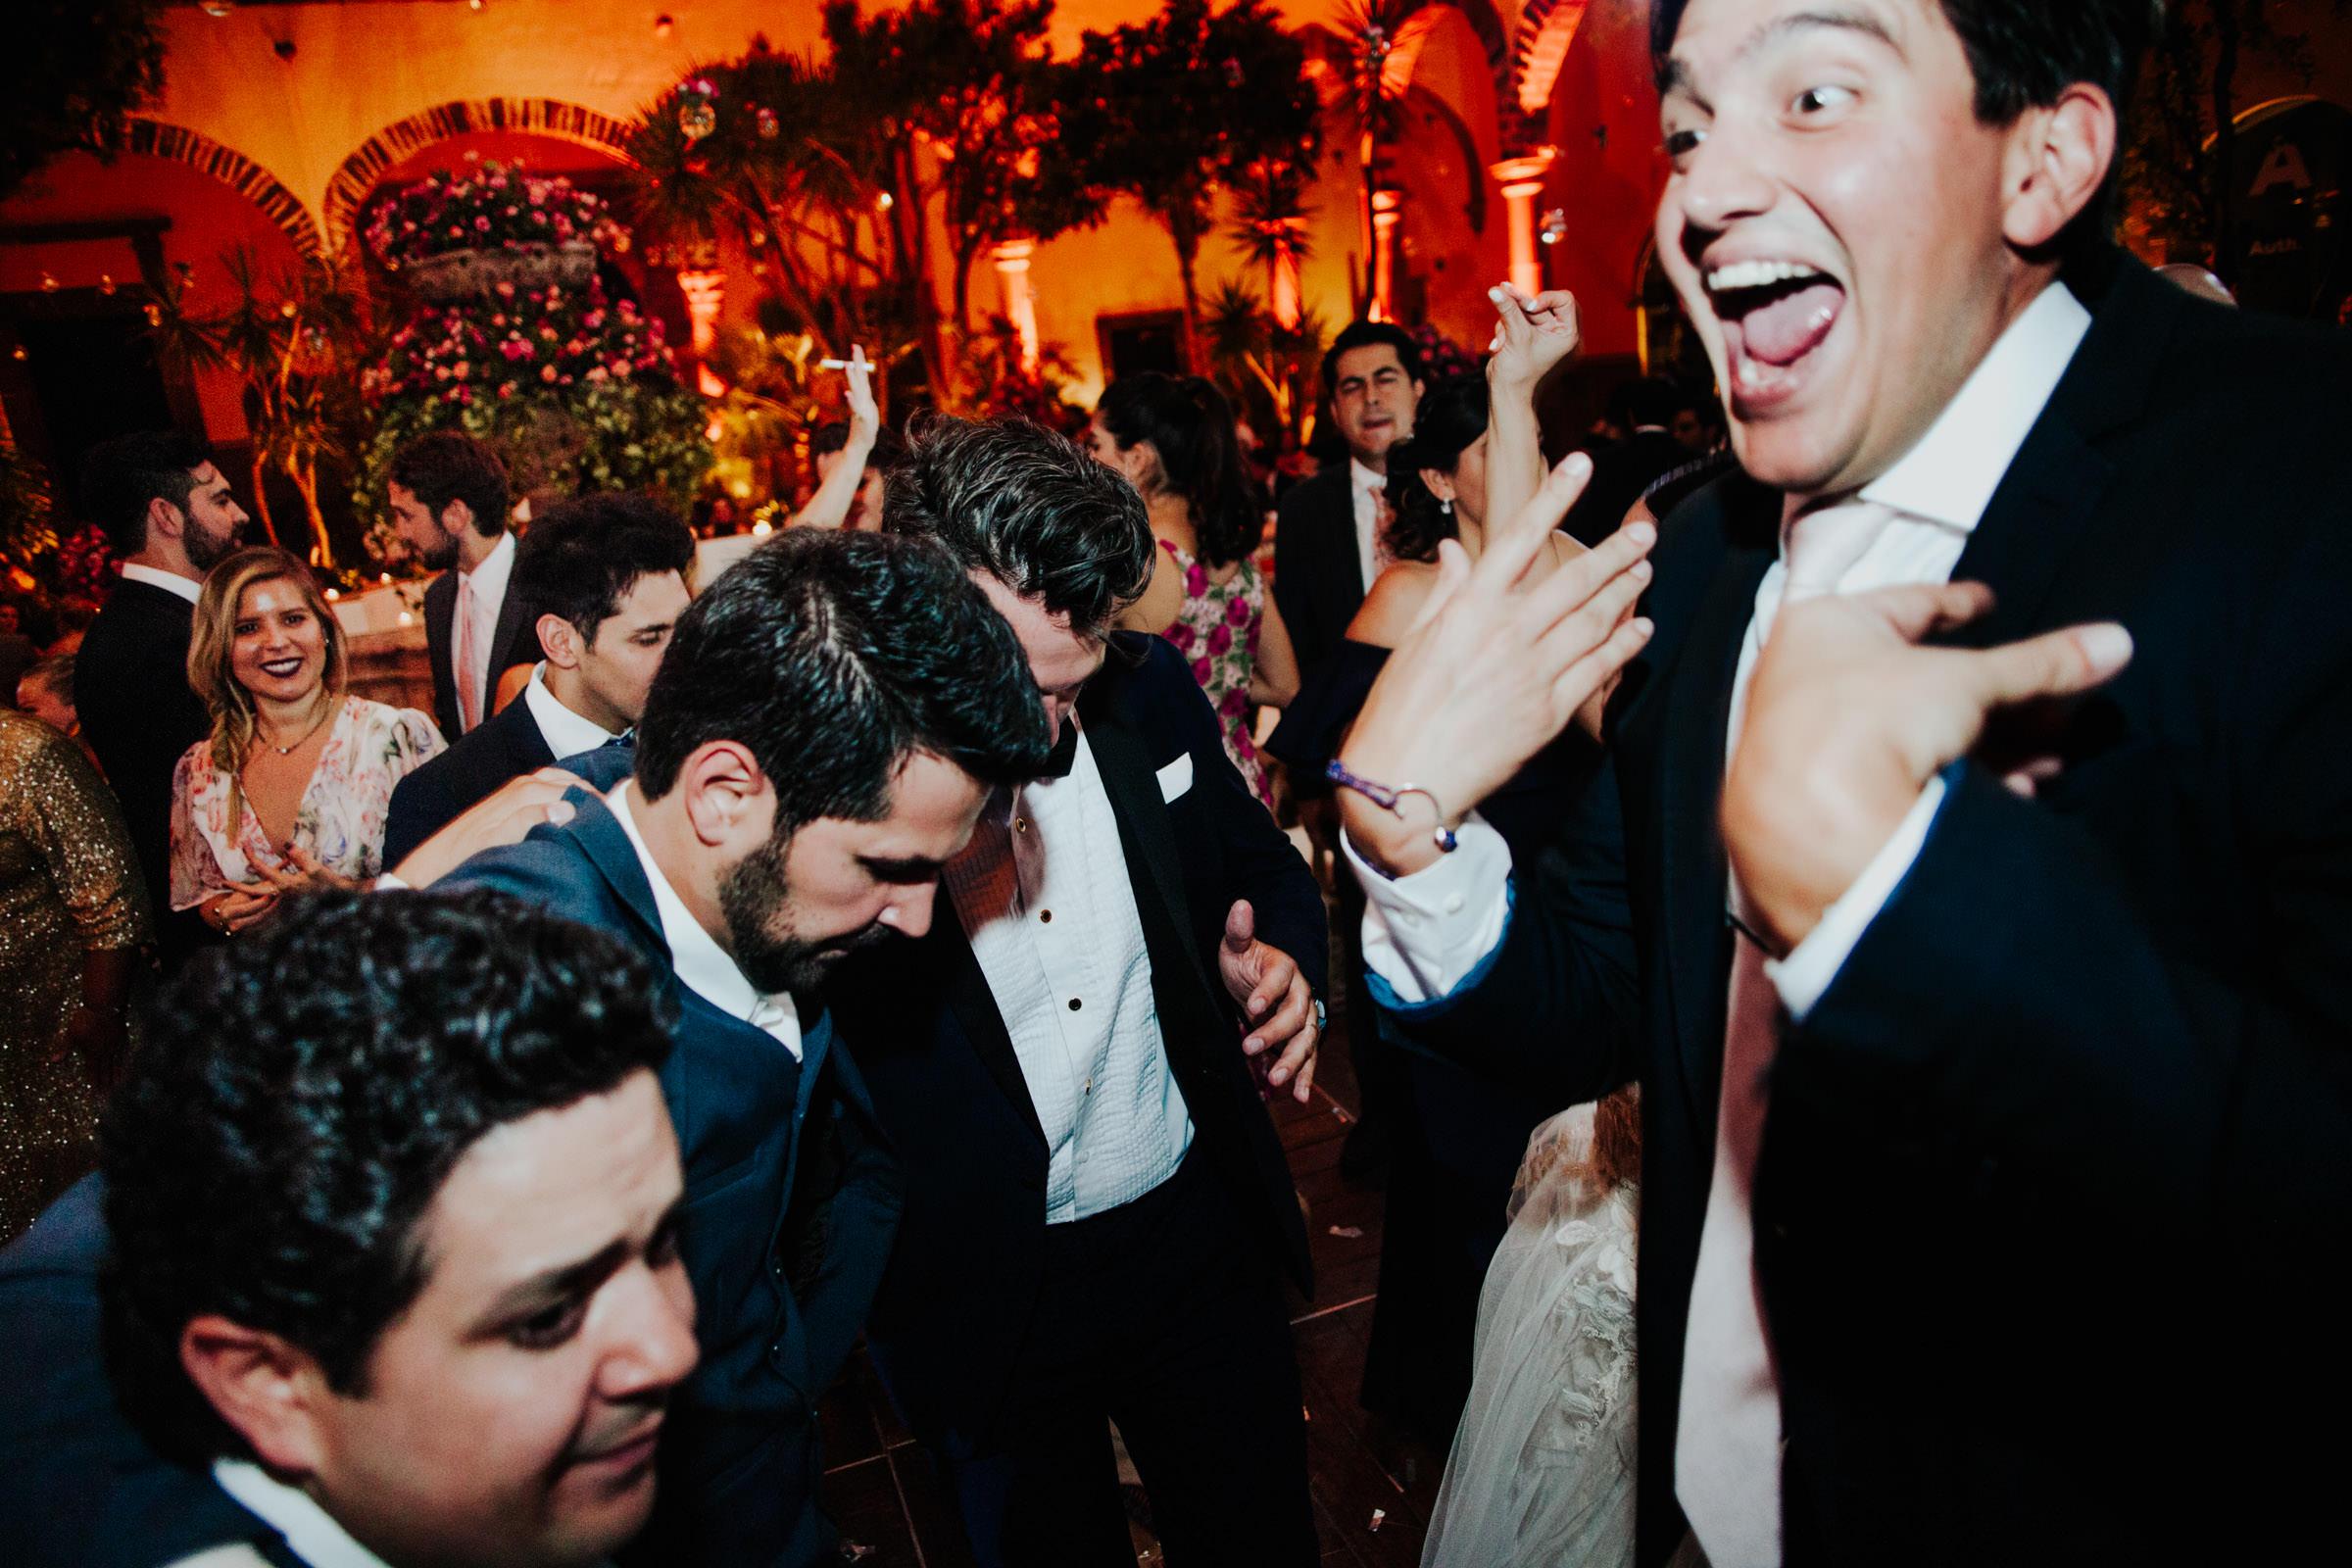 San-Miguel-de-Allende-Wedding-Photography-Parroquia-Instituto-Boda-Fotografia-Fer-Sergio-Pierce-Lifestyle-Photography0073.JPG